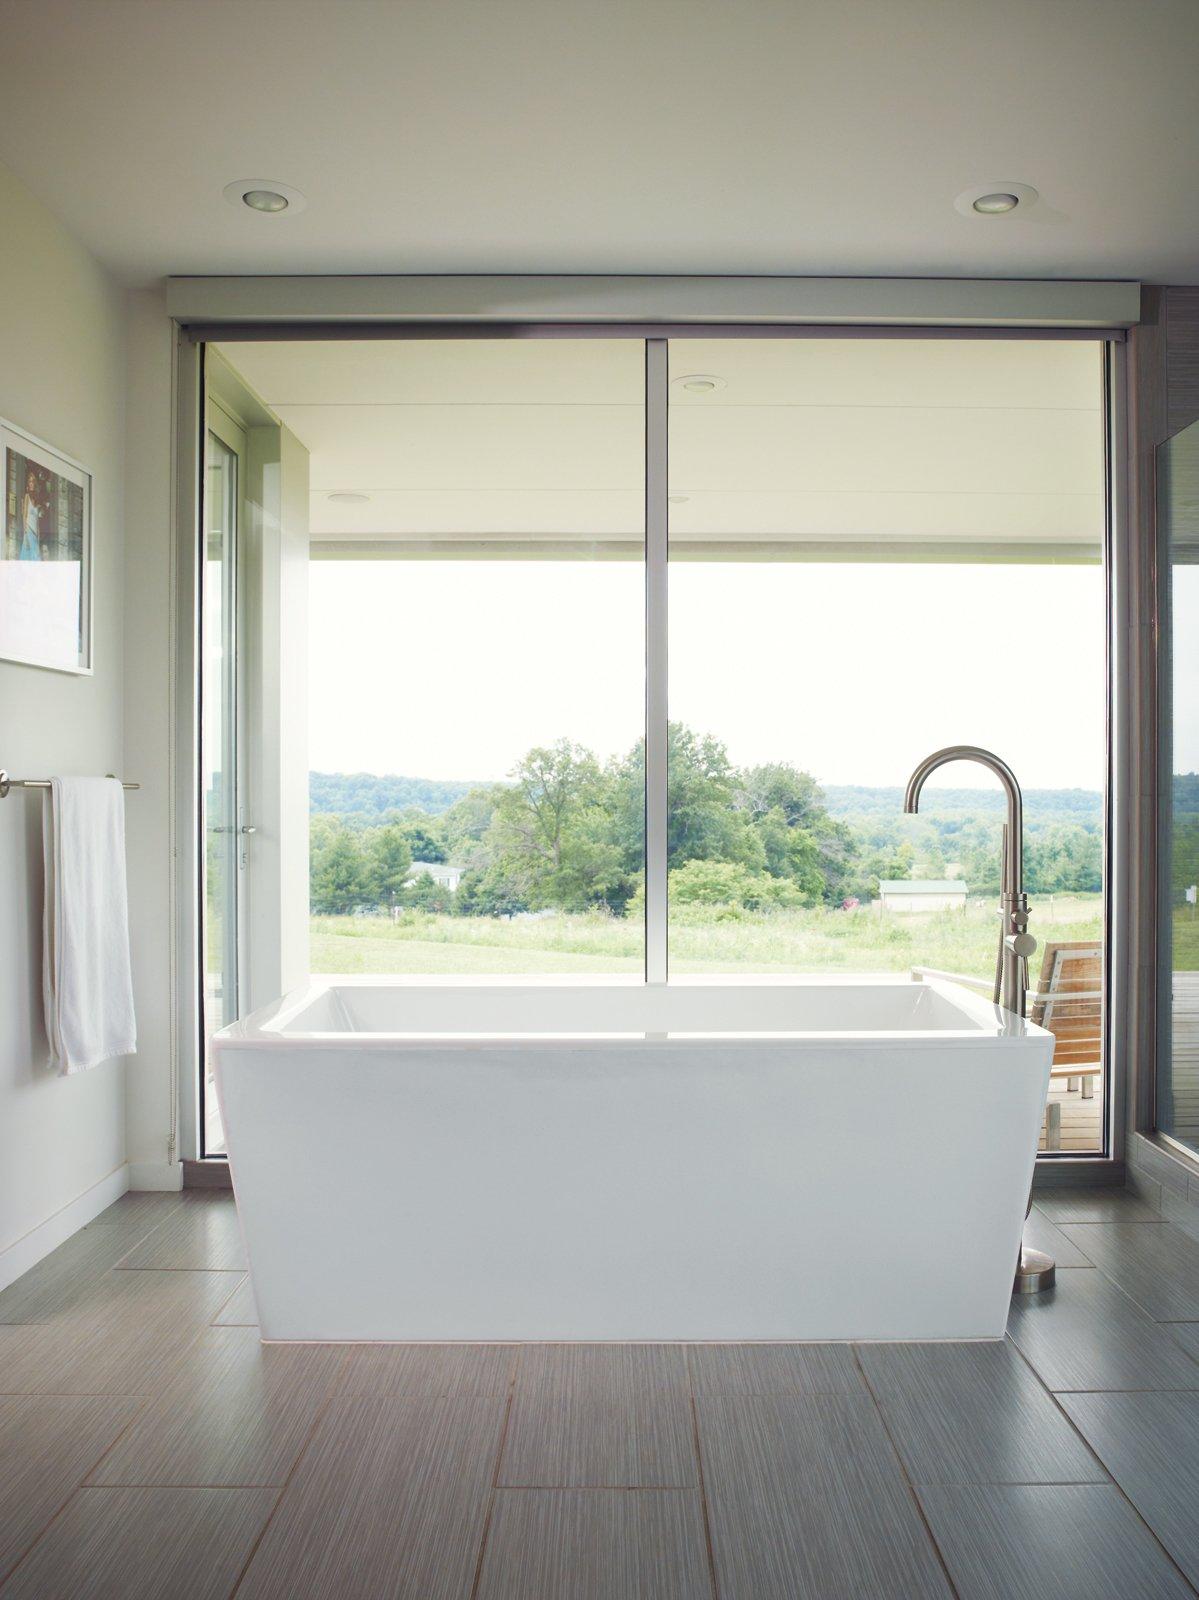 #bath #spa #bath&spa #modern #interior #bathtub #farmhouse #missouri #porchhouse #hufftprojects   Photo courtesy of Joe Pugliese Tagged: Bath Room, Ceramic Tile Floor, and Freestanding Tub.  Photo 2 of 22 in Bath & Spa Intrigue